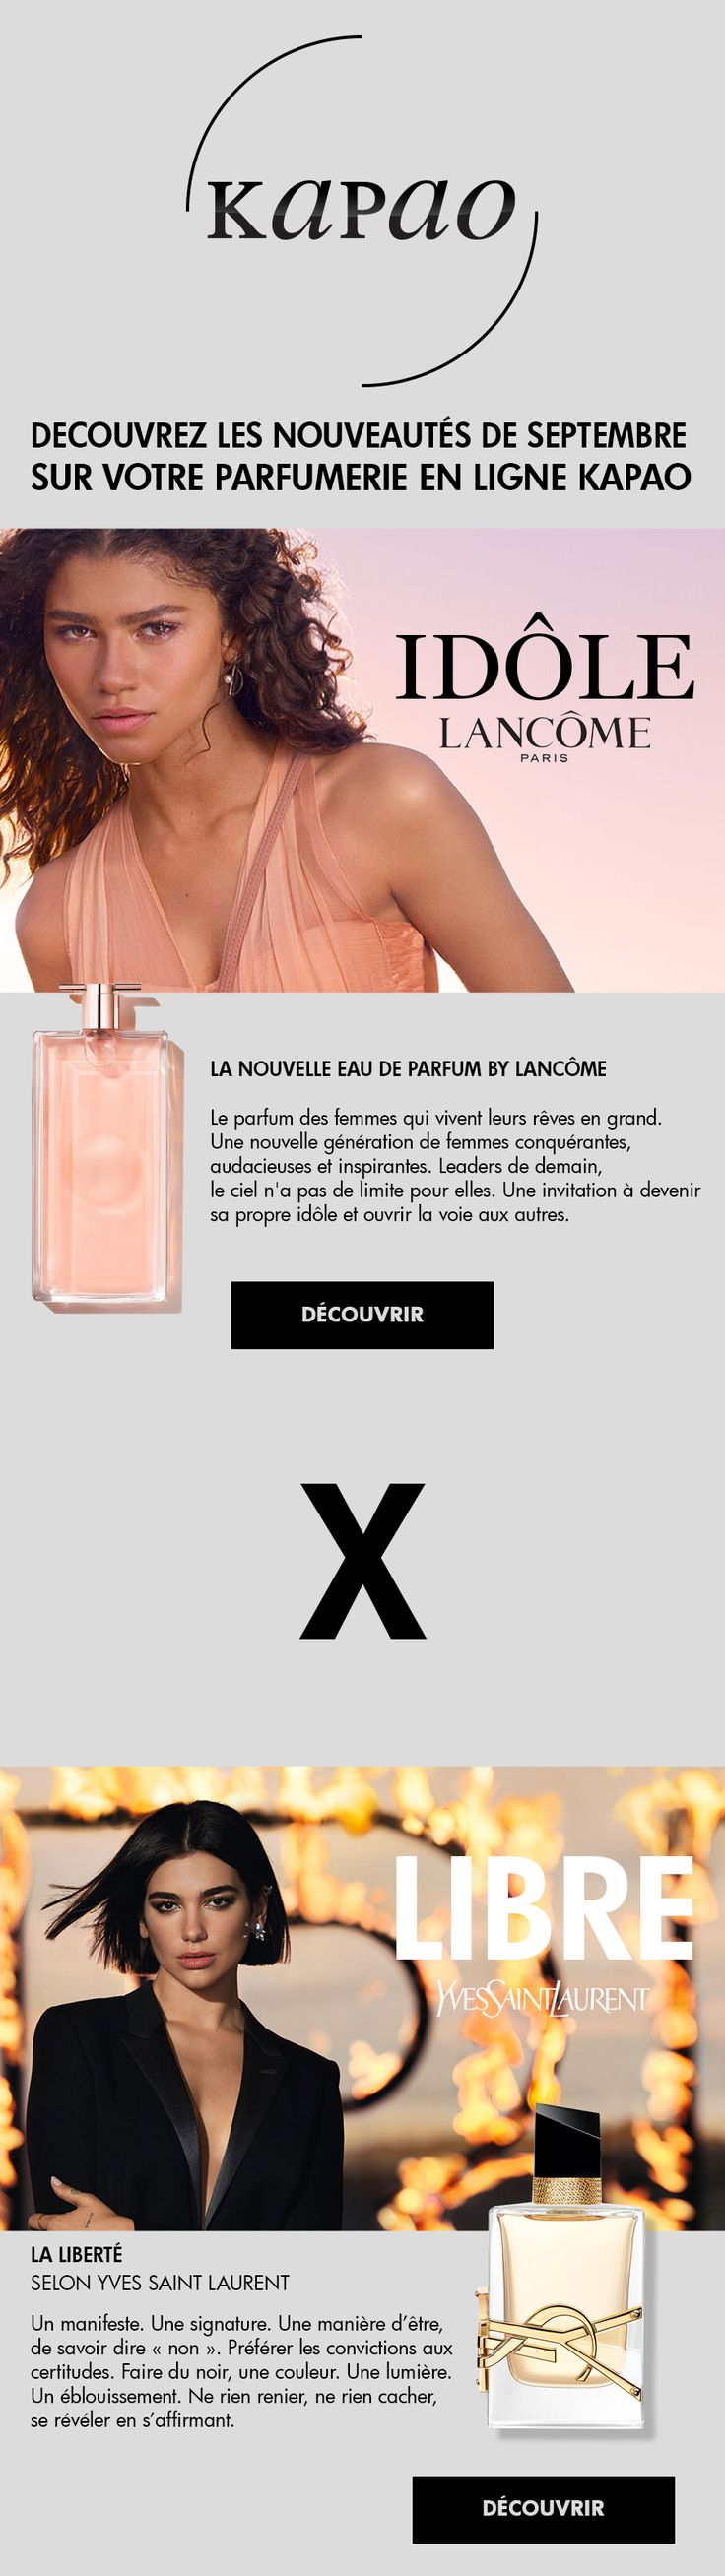 parfume.de newsletter